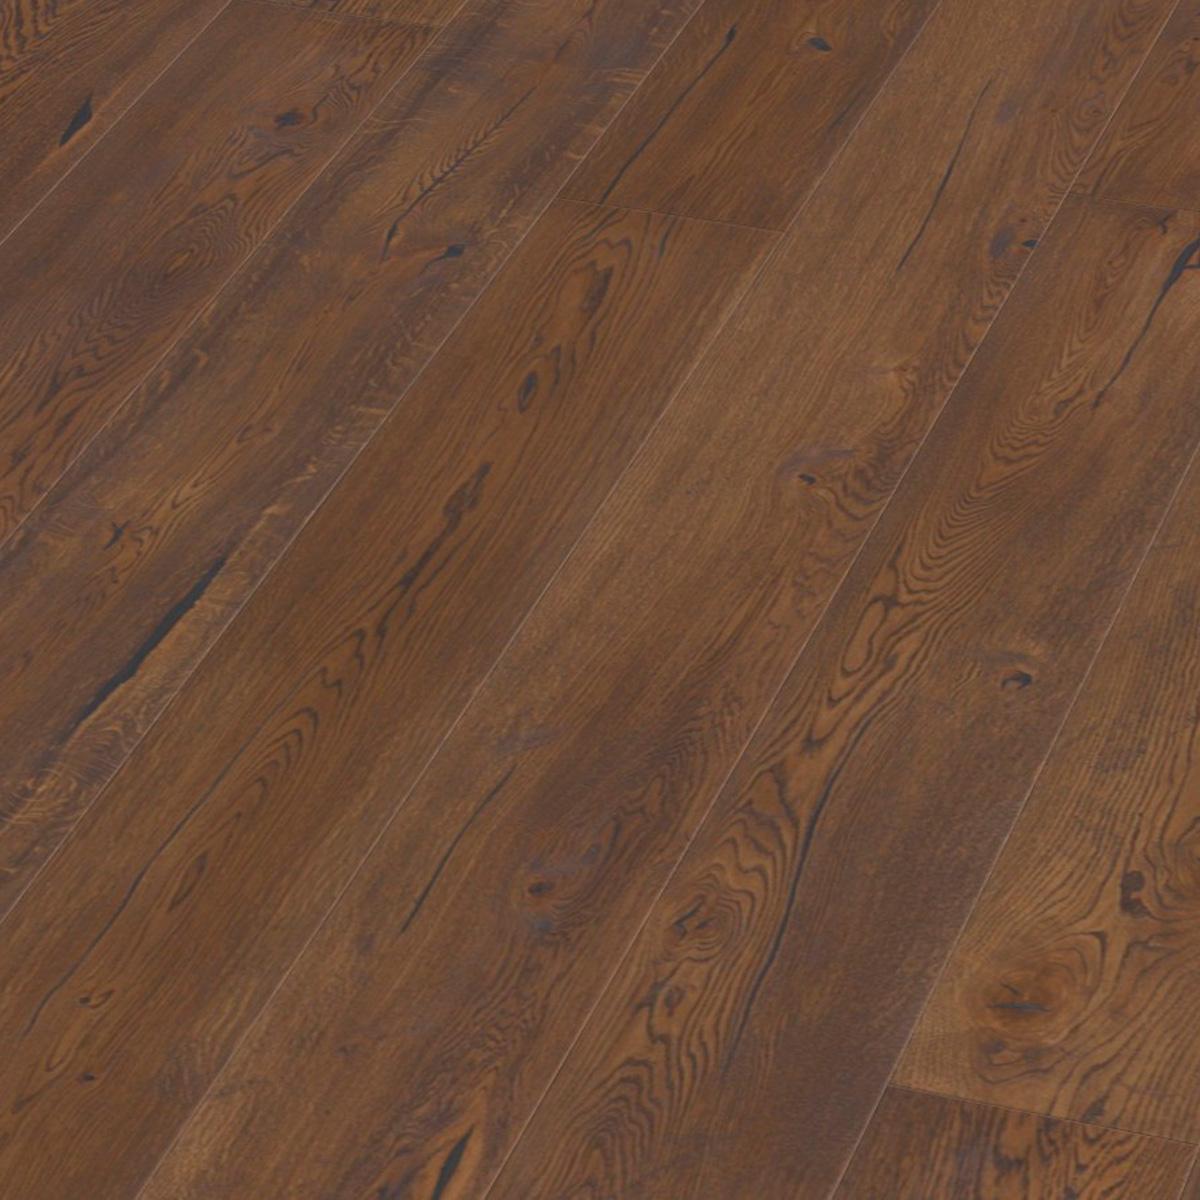 Parchet stratificat stejar antique brown hand crafted plank_1